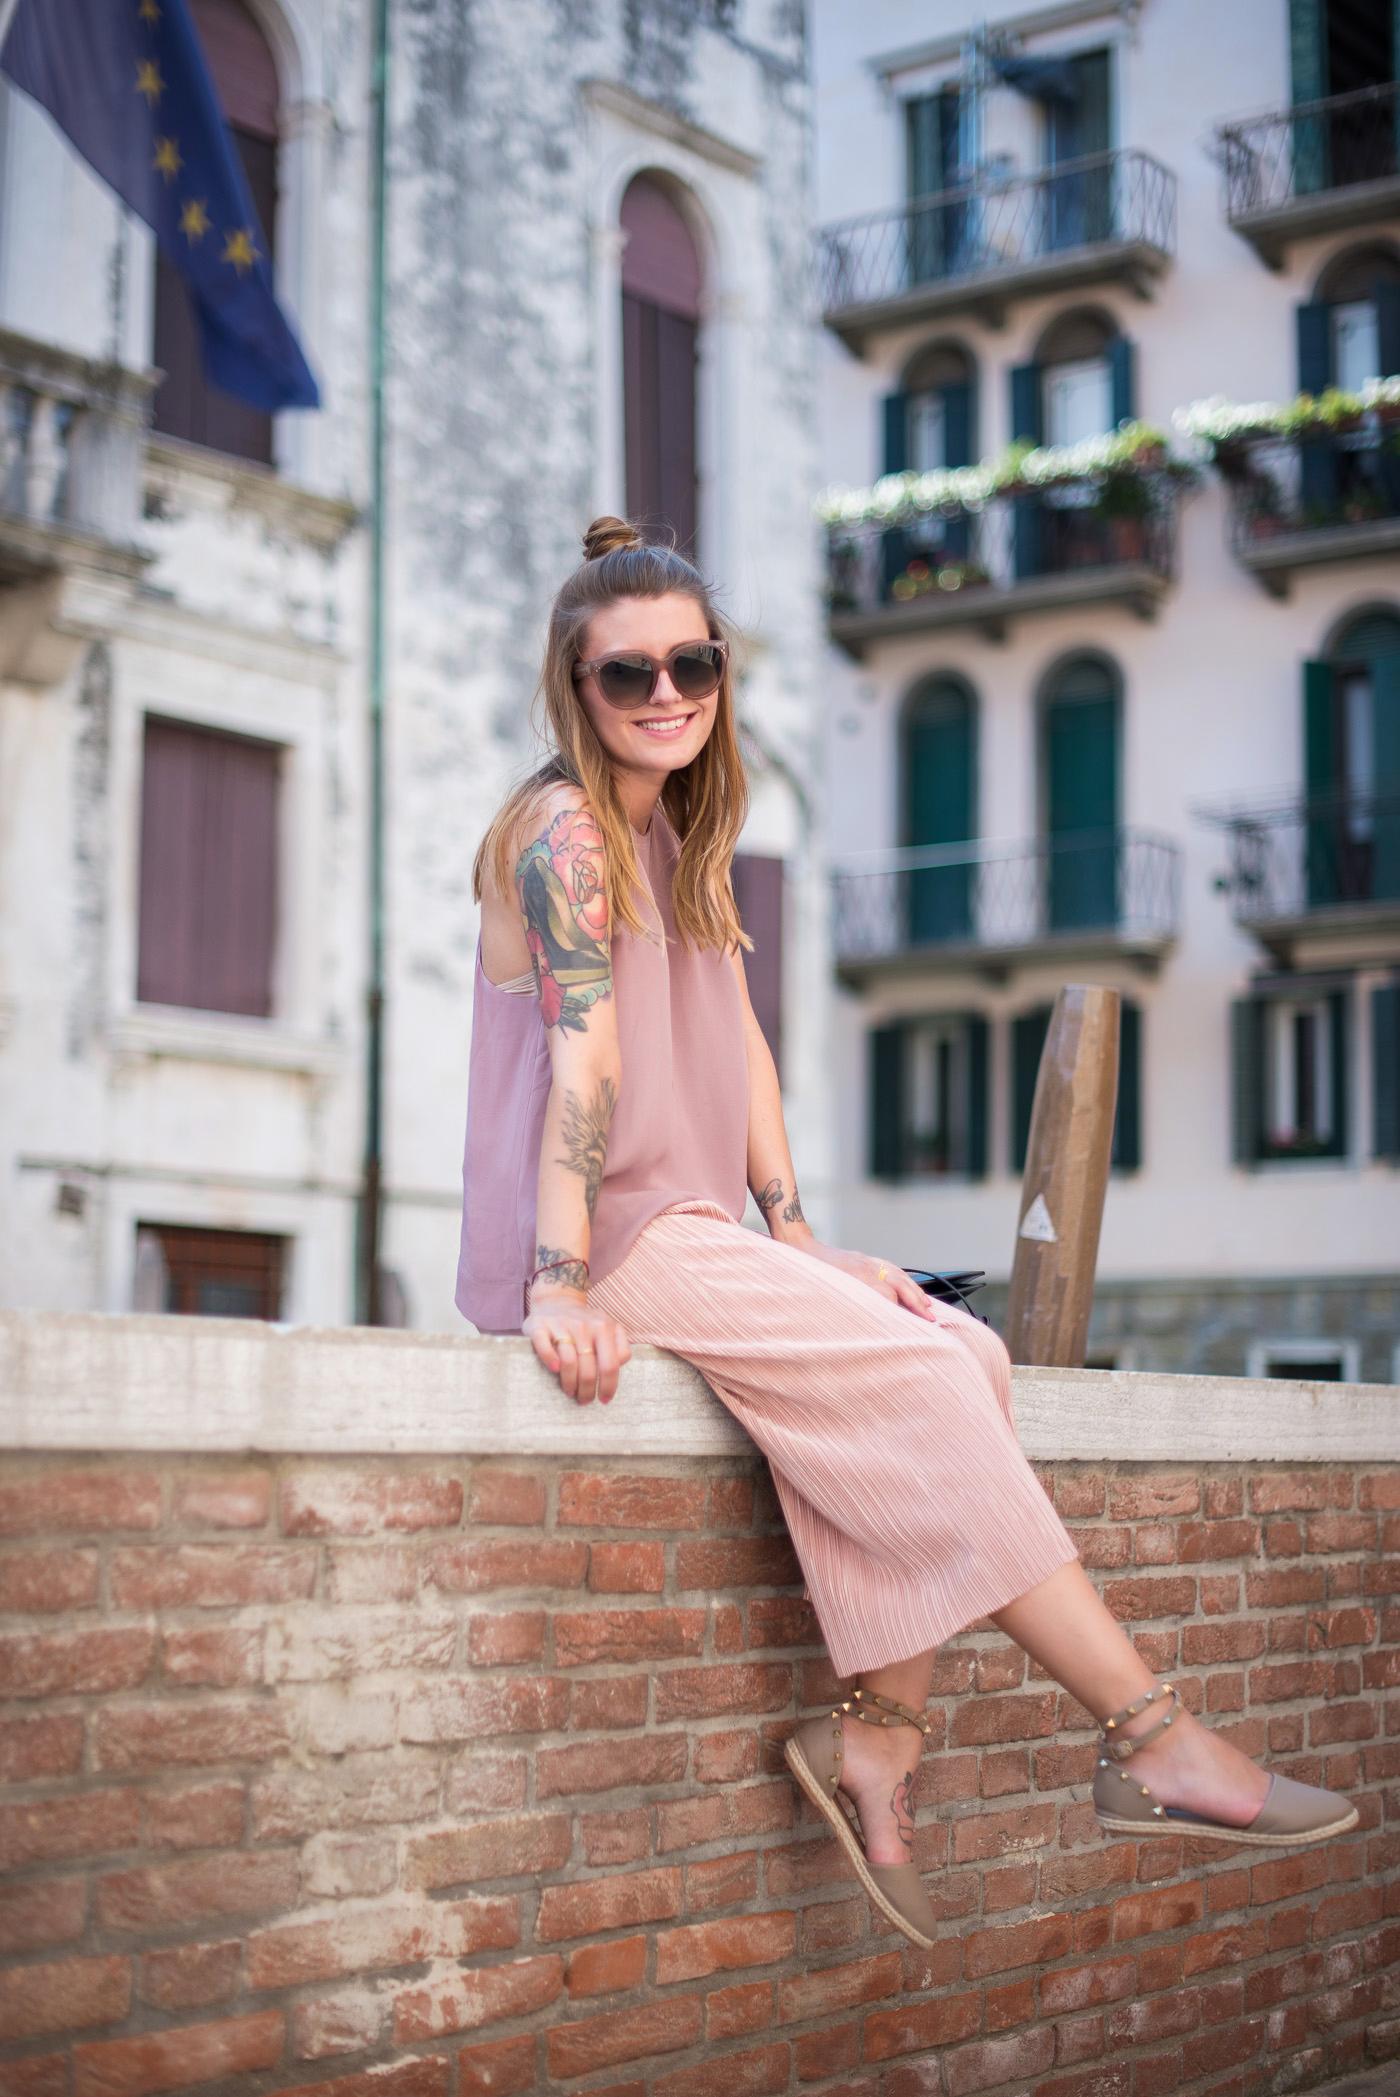 Candy_colors_culotte_outfit_in_Venezia_4